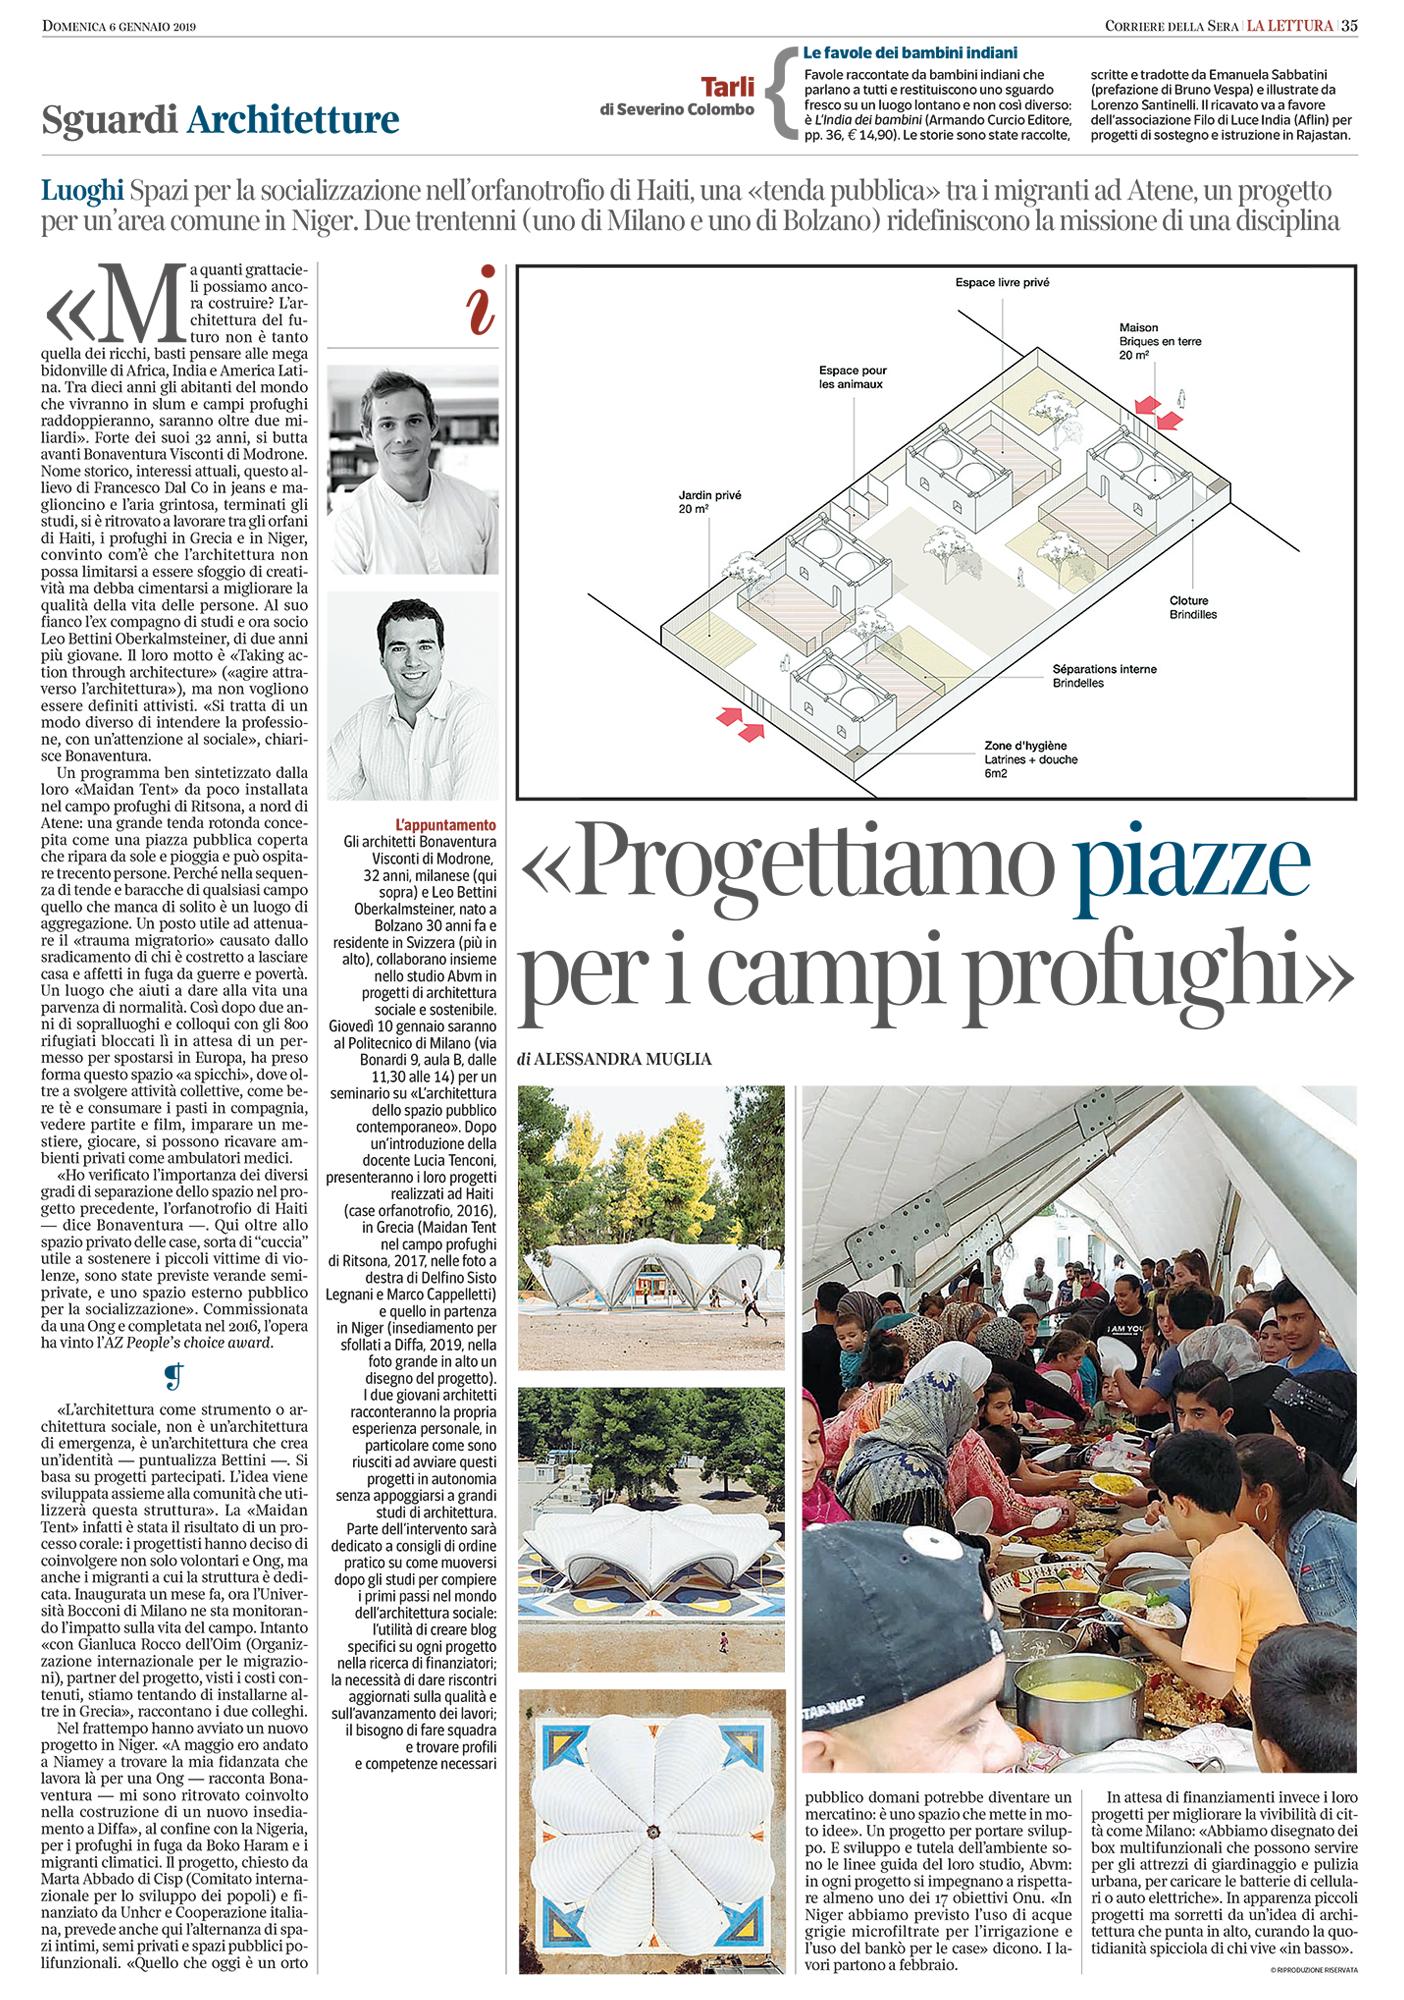 Corriere pagina.jpg